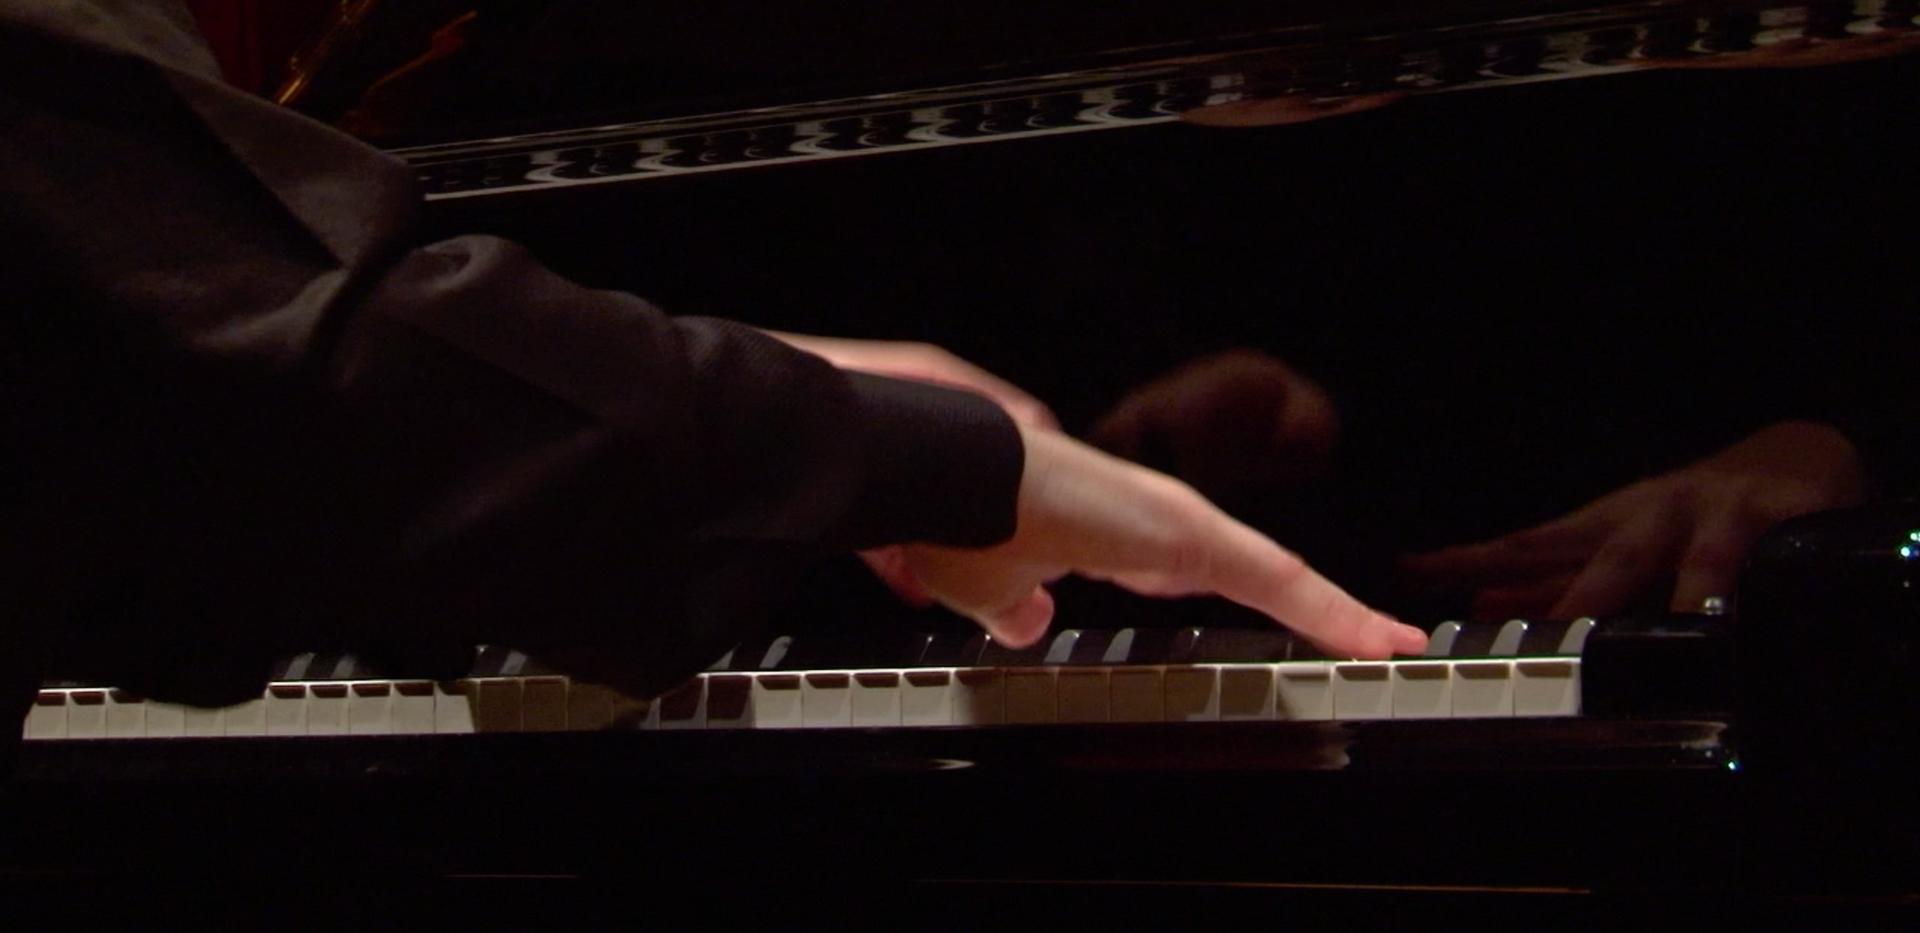 Alexander Malofeev in Recital